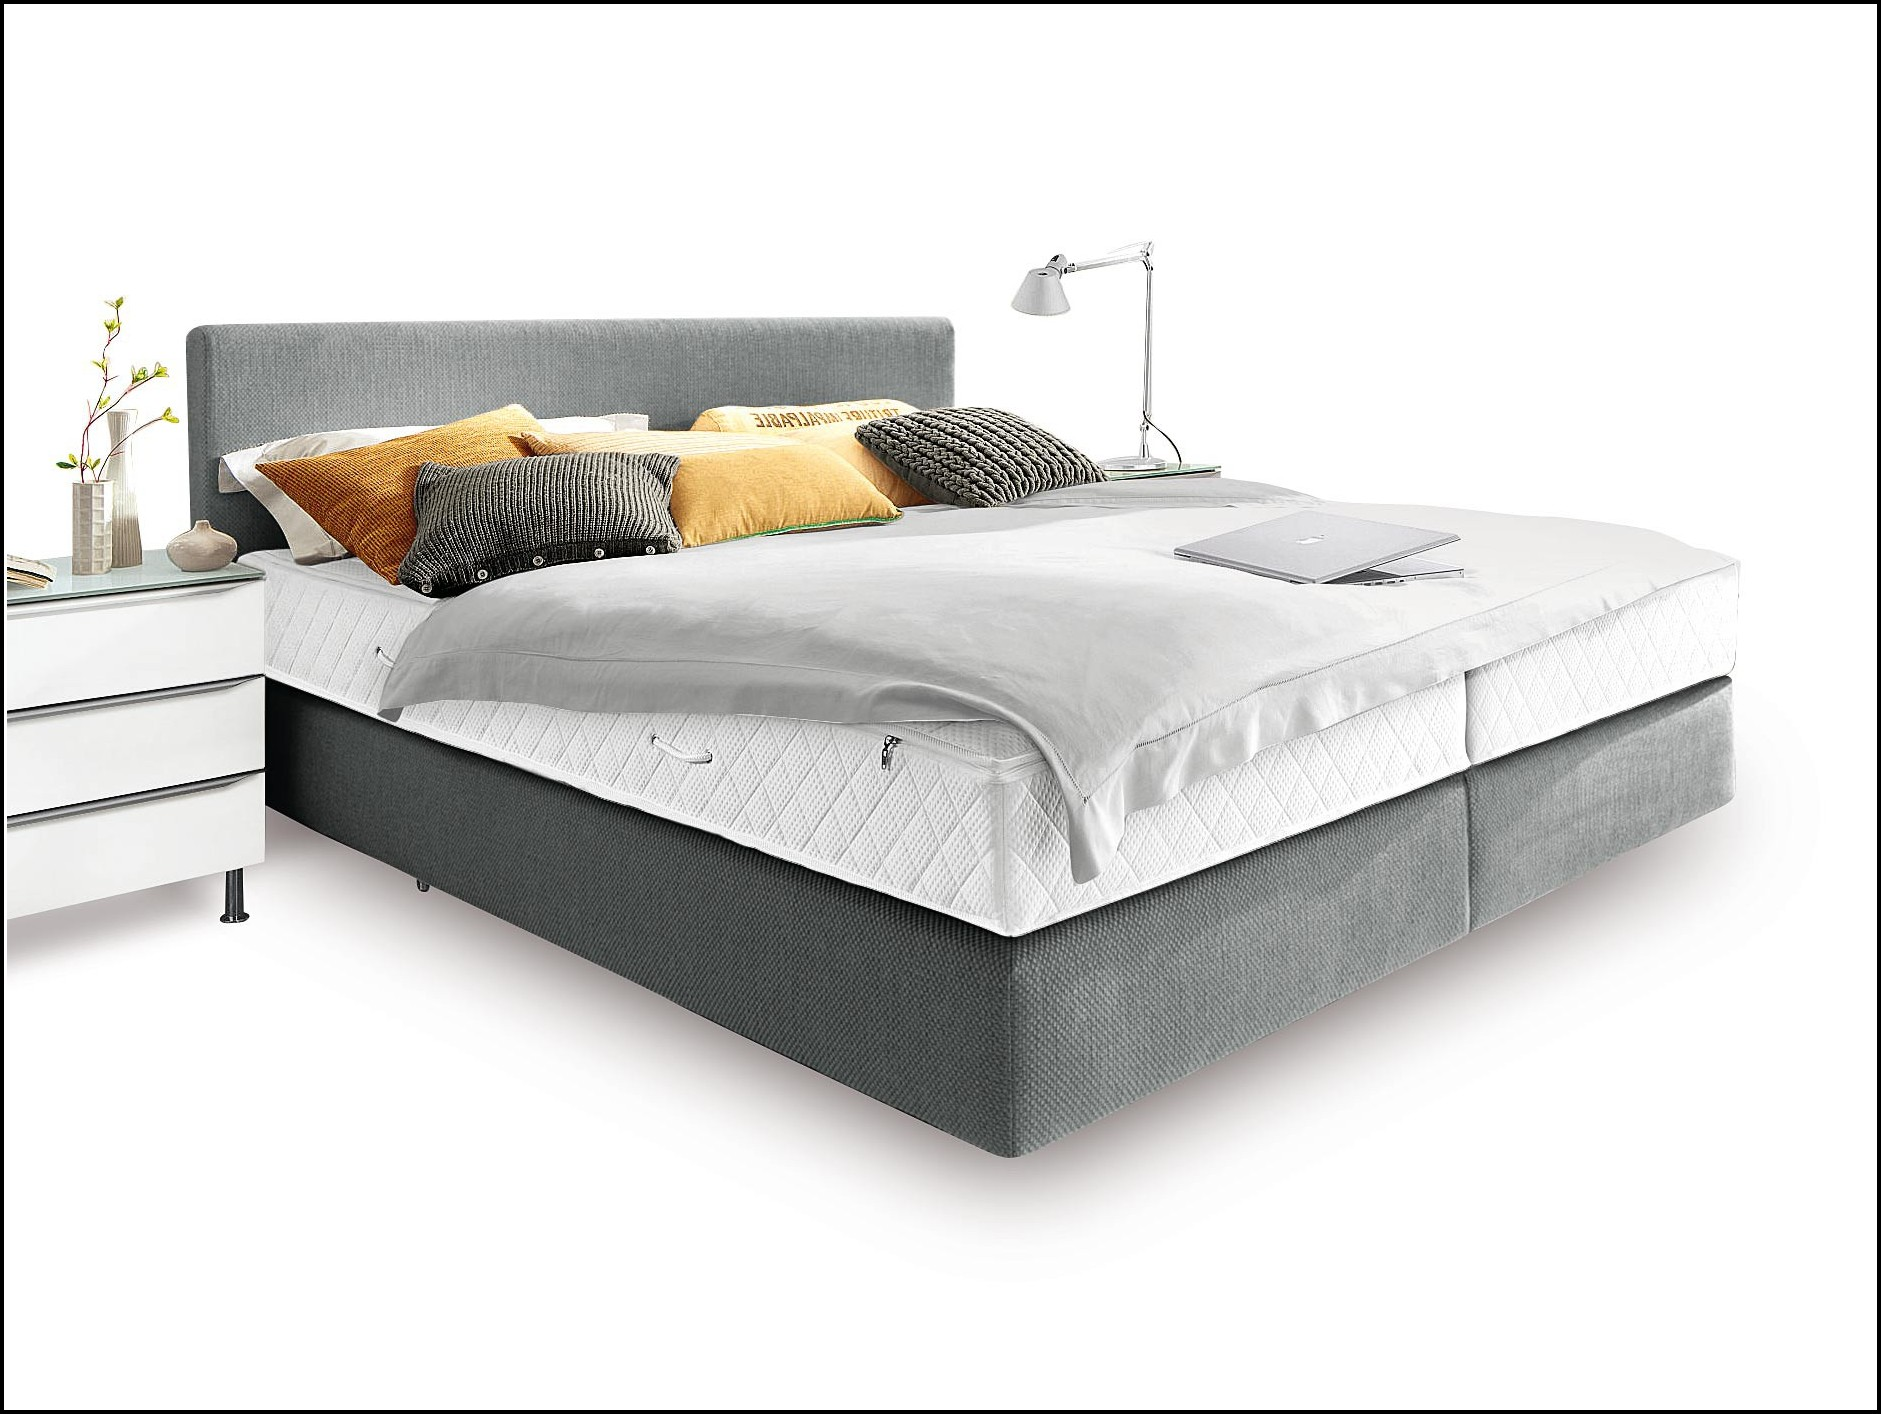 Hülsta Boxspring Bett Suite Design